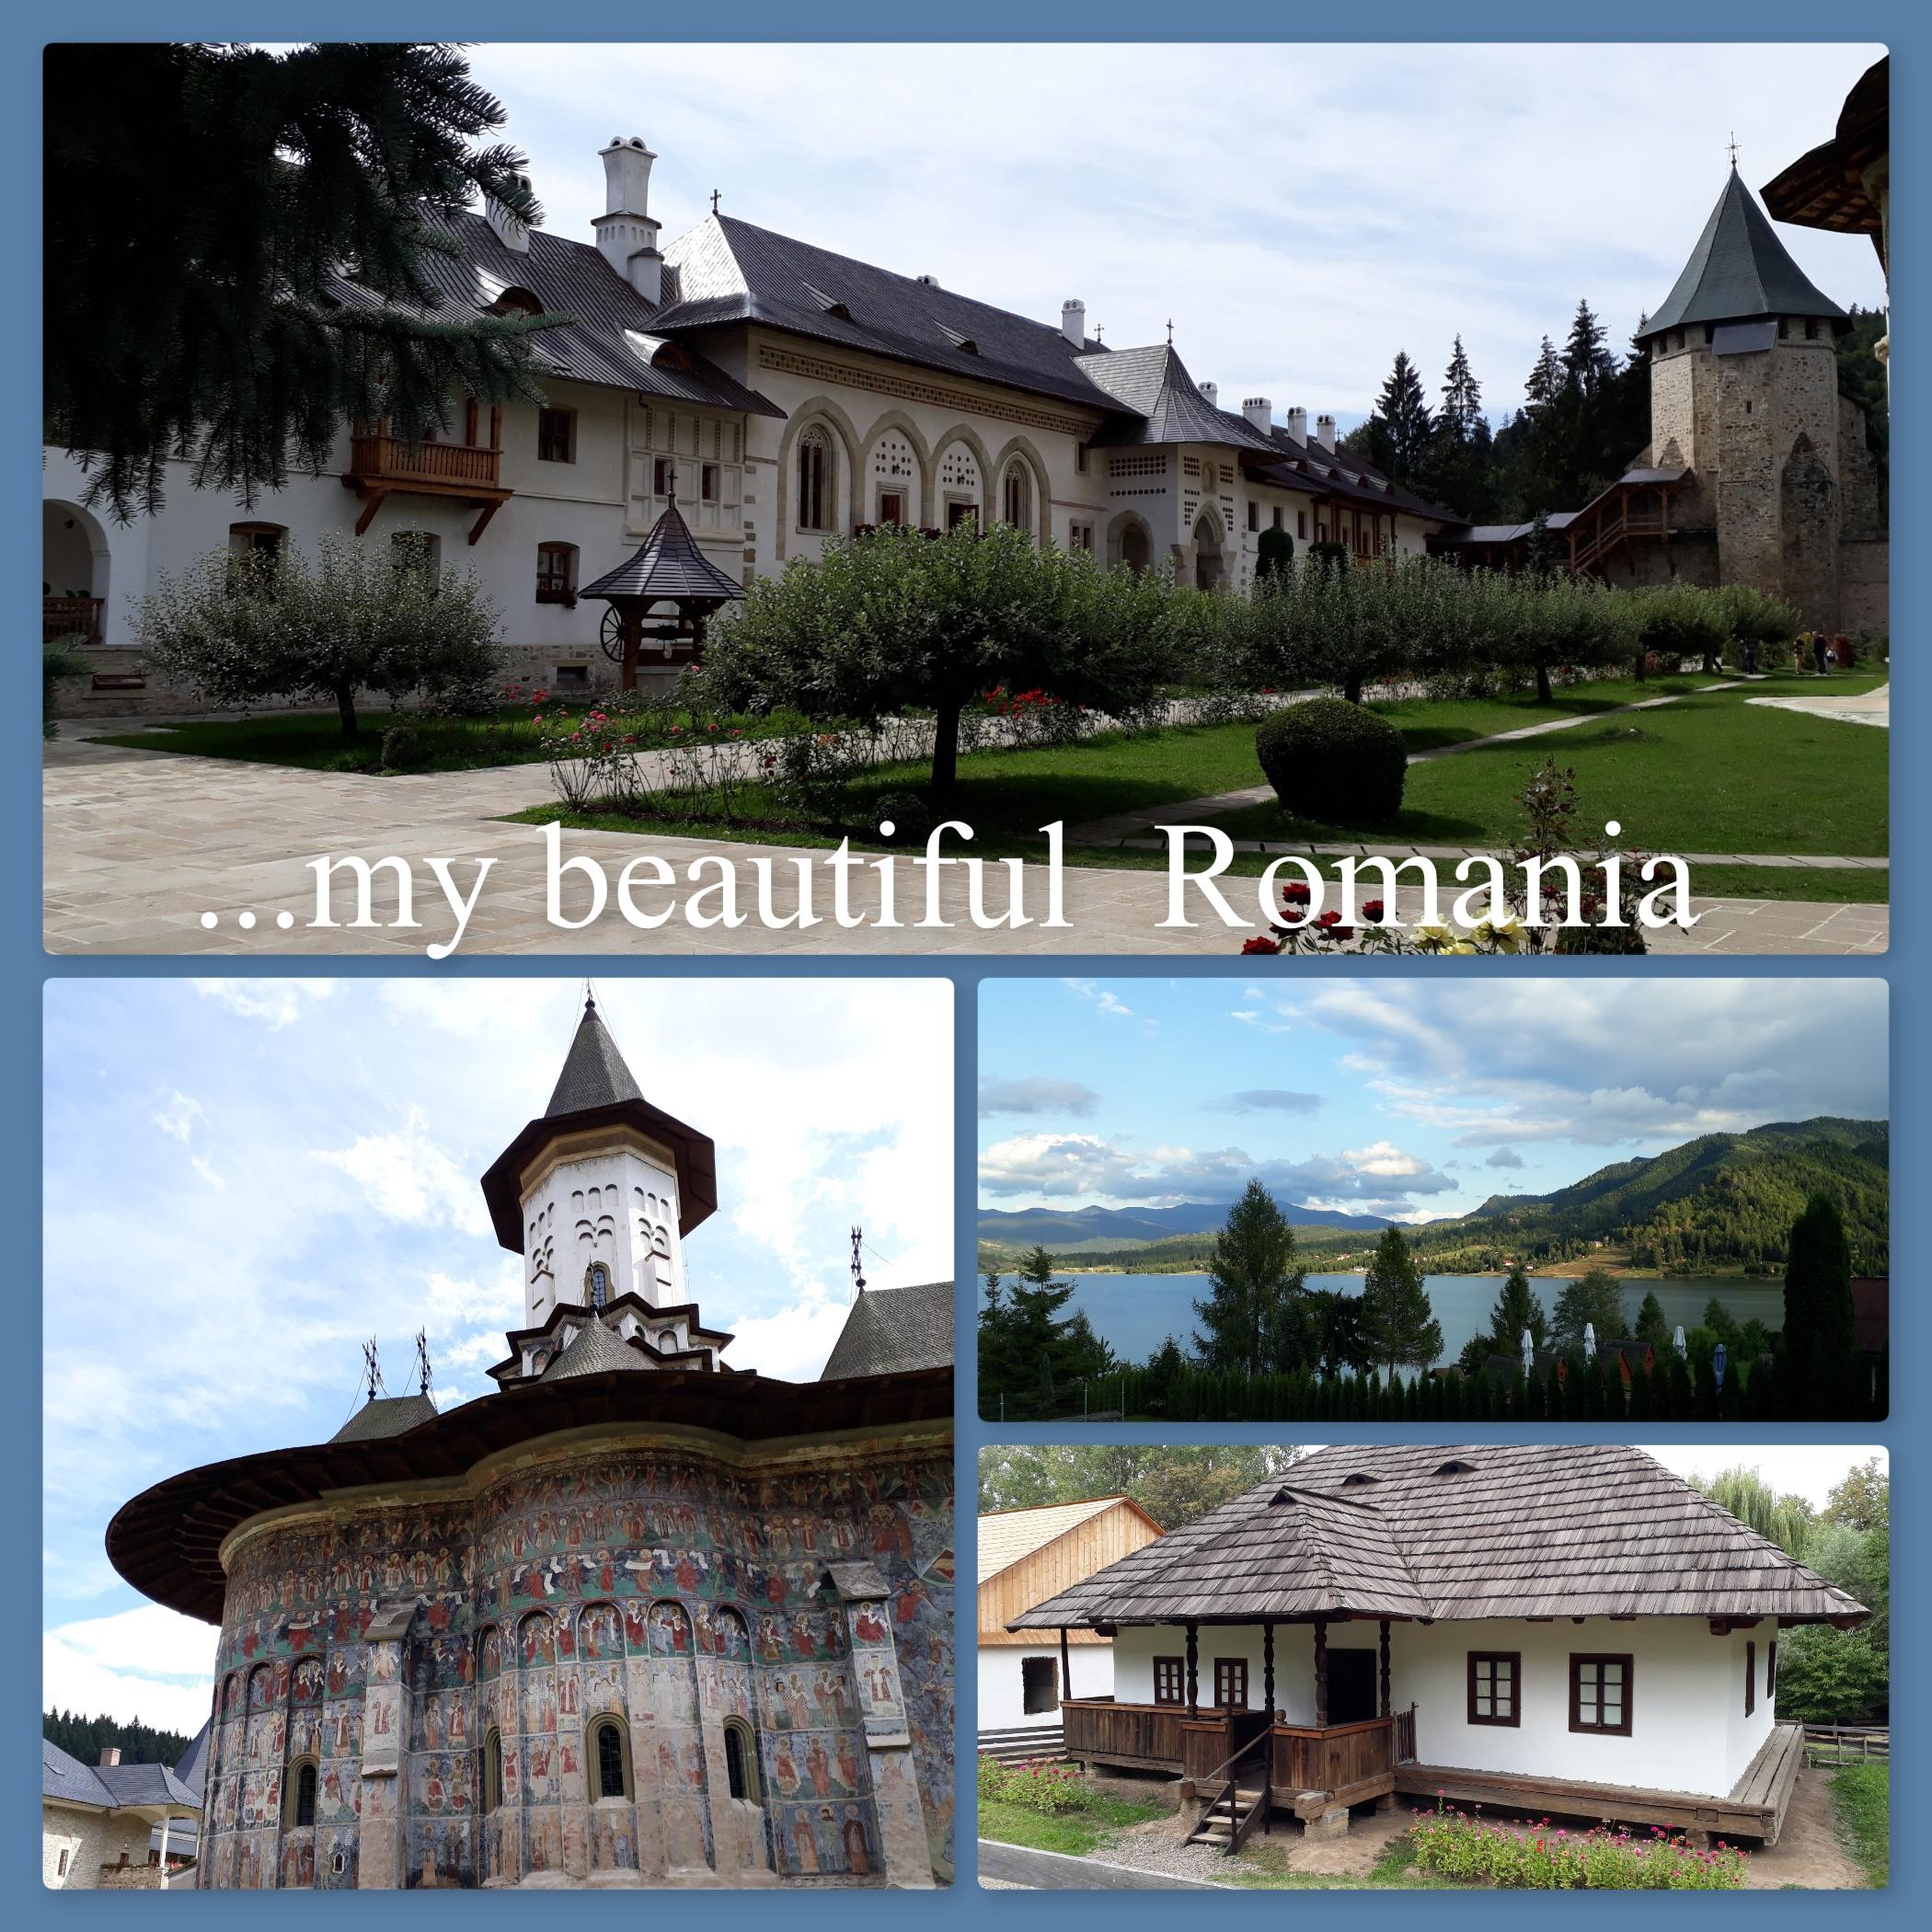 Maria's Photos of Romania